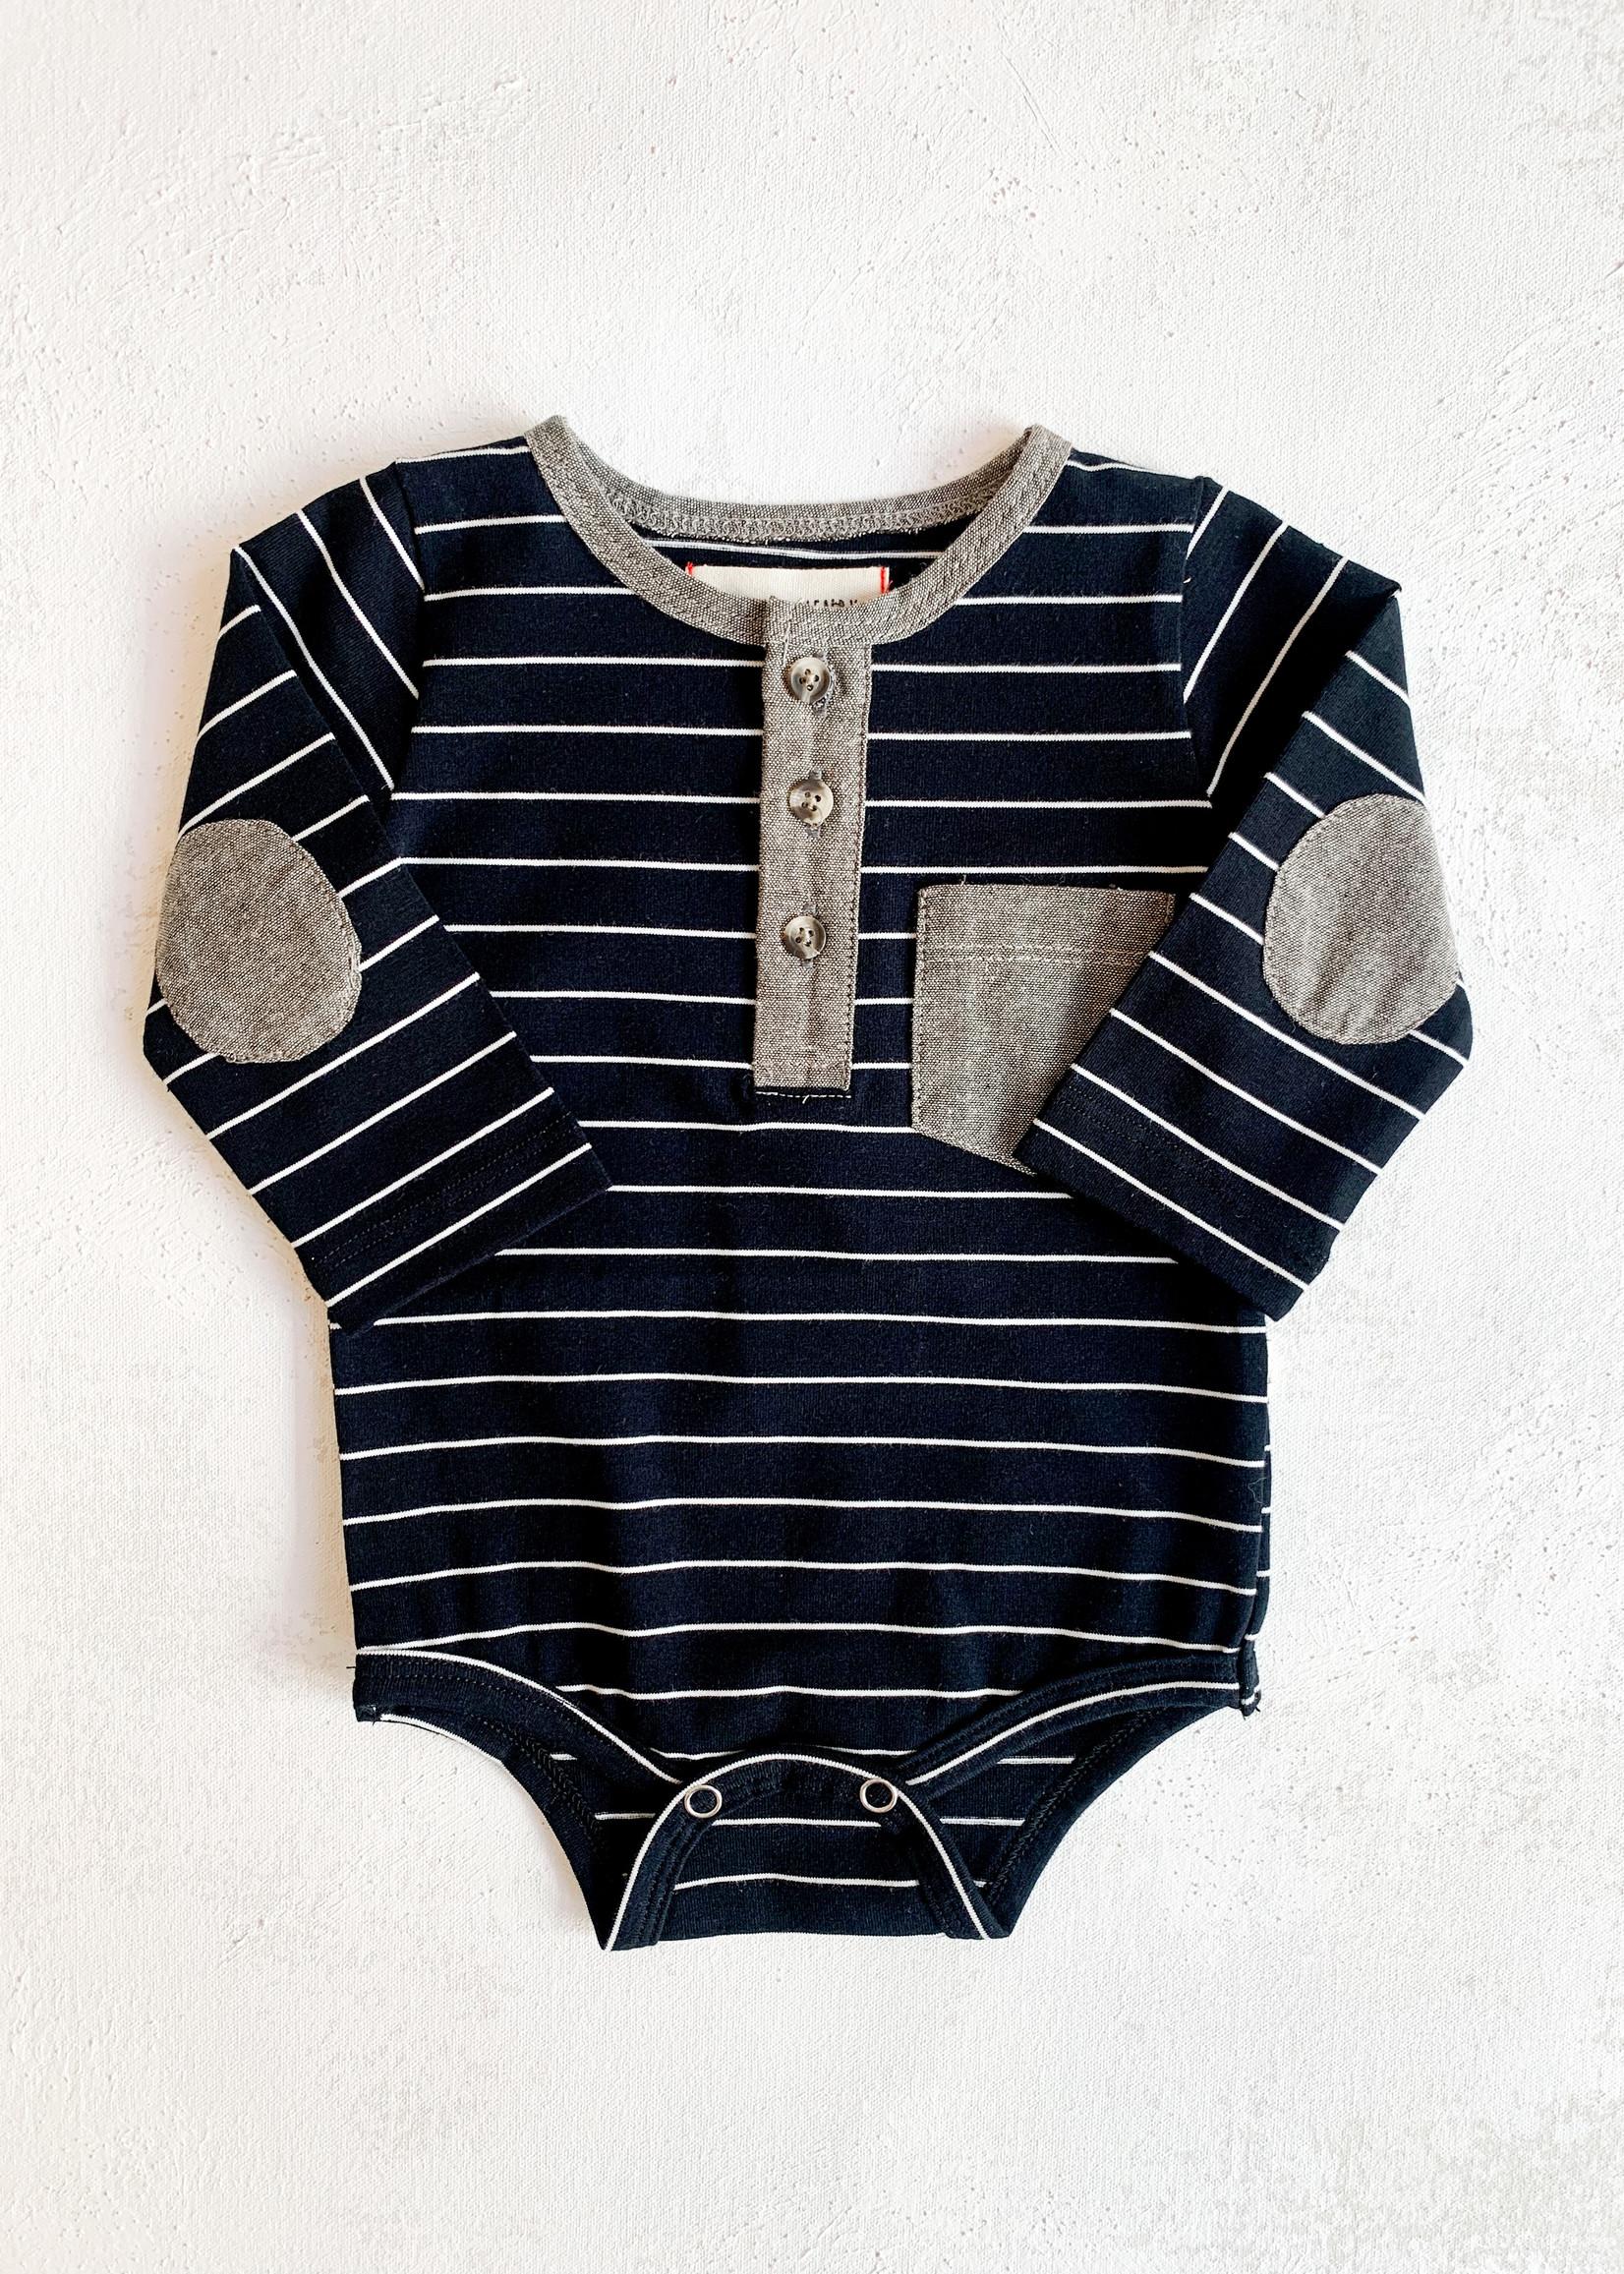 Elitaire Petite Henley Onesie in Black Stripe